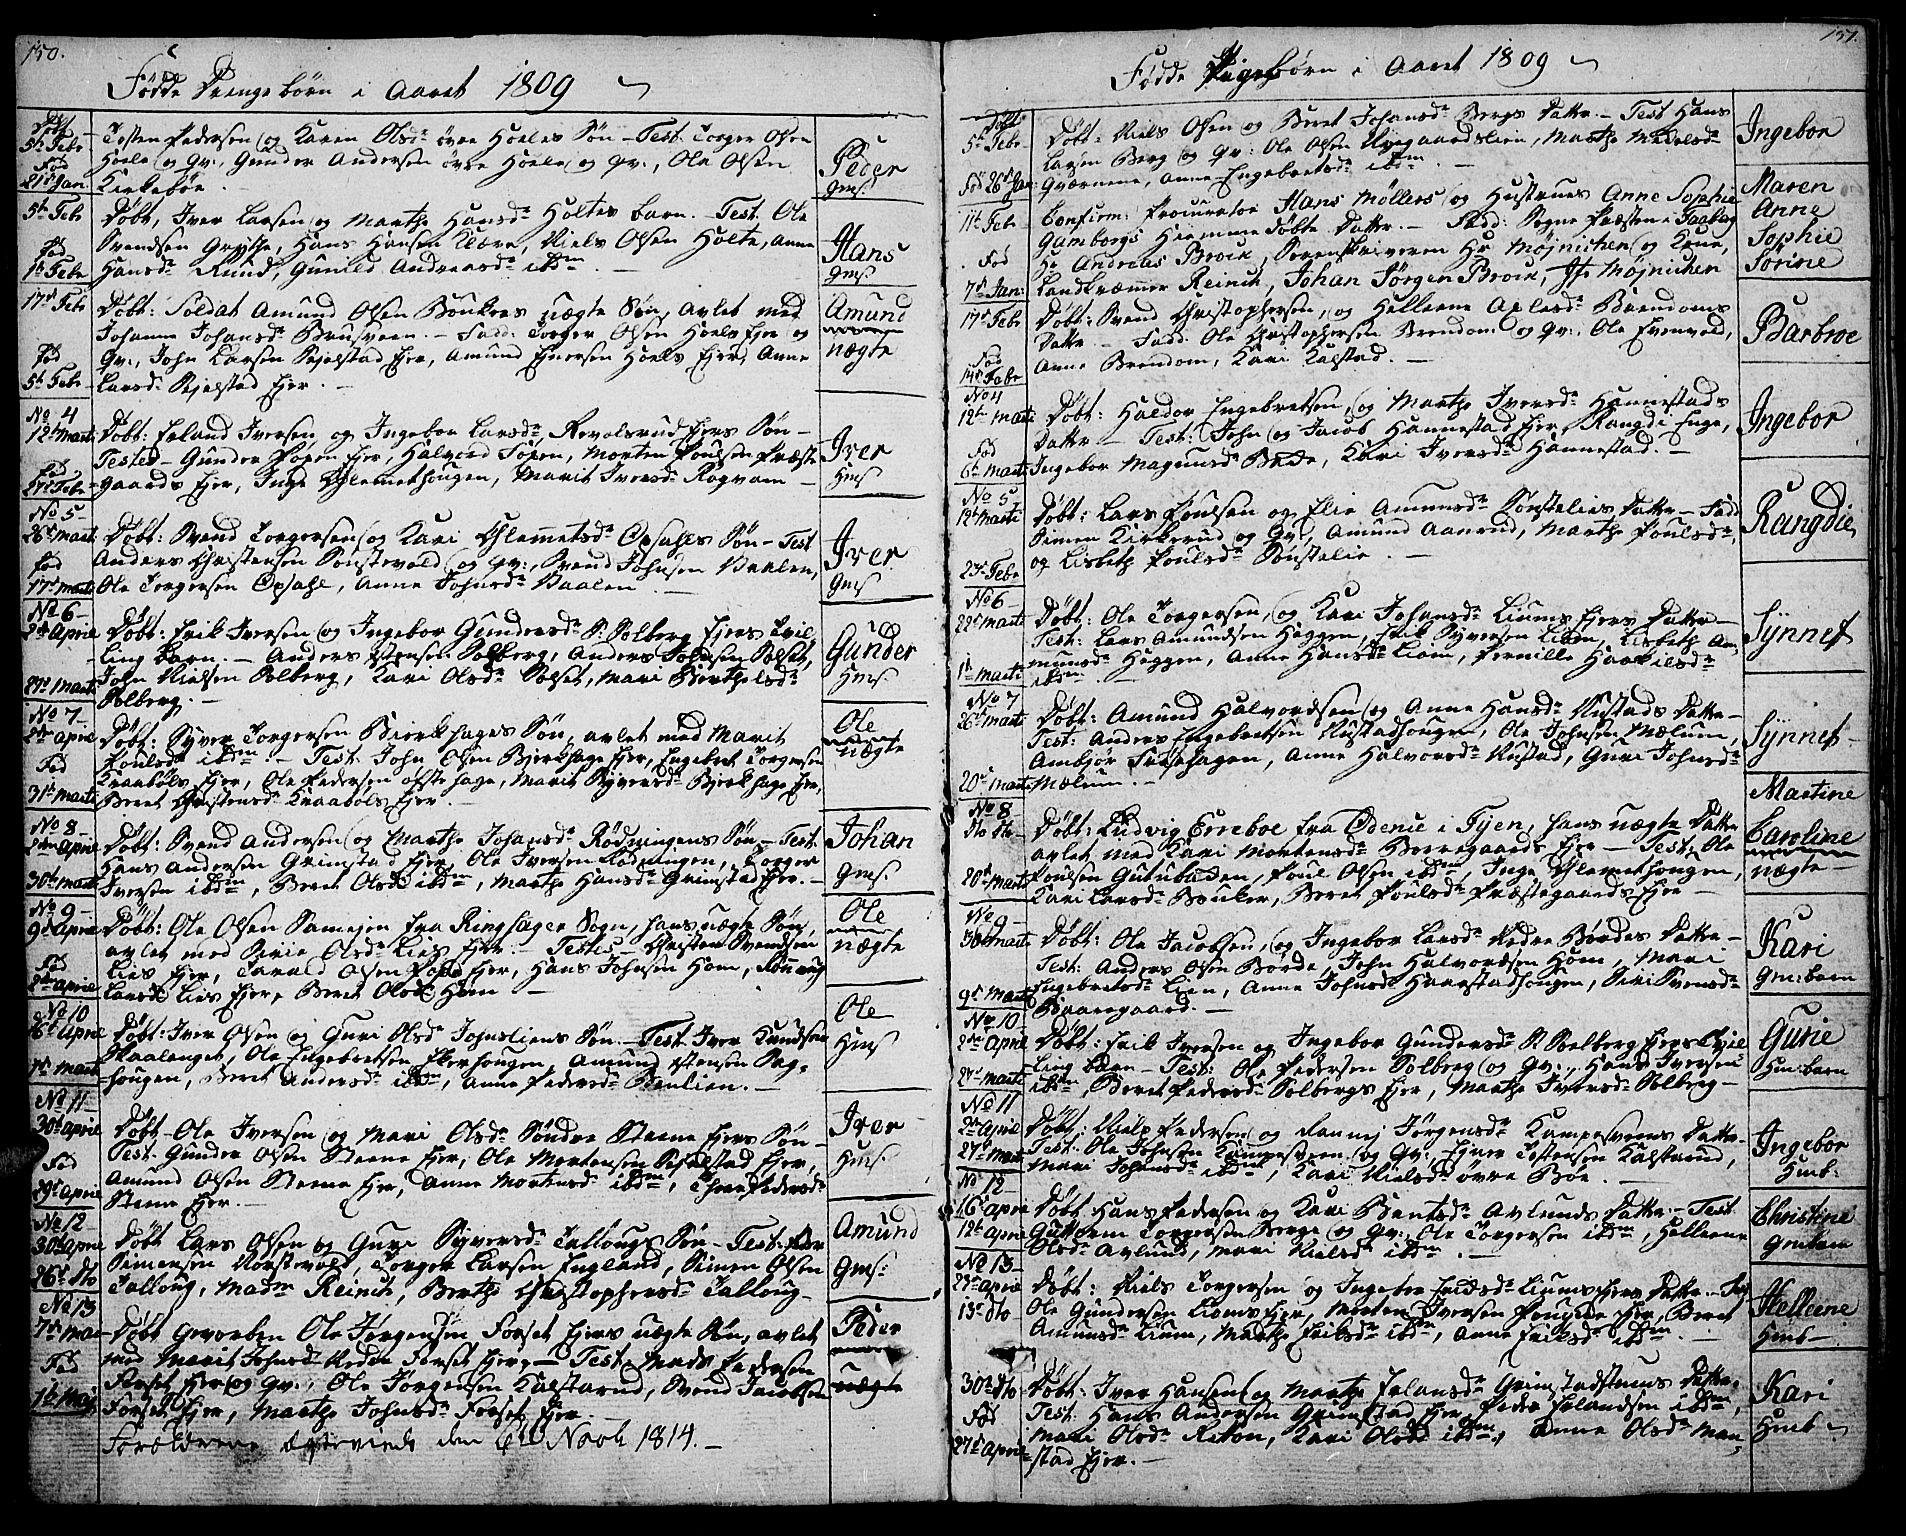 SAH, Gausdal prestekontor, Ministerialbok nr. 4, 1809-1817, s. 150-151